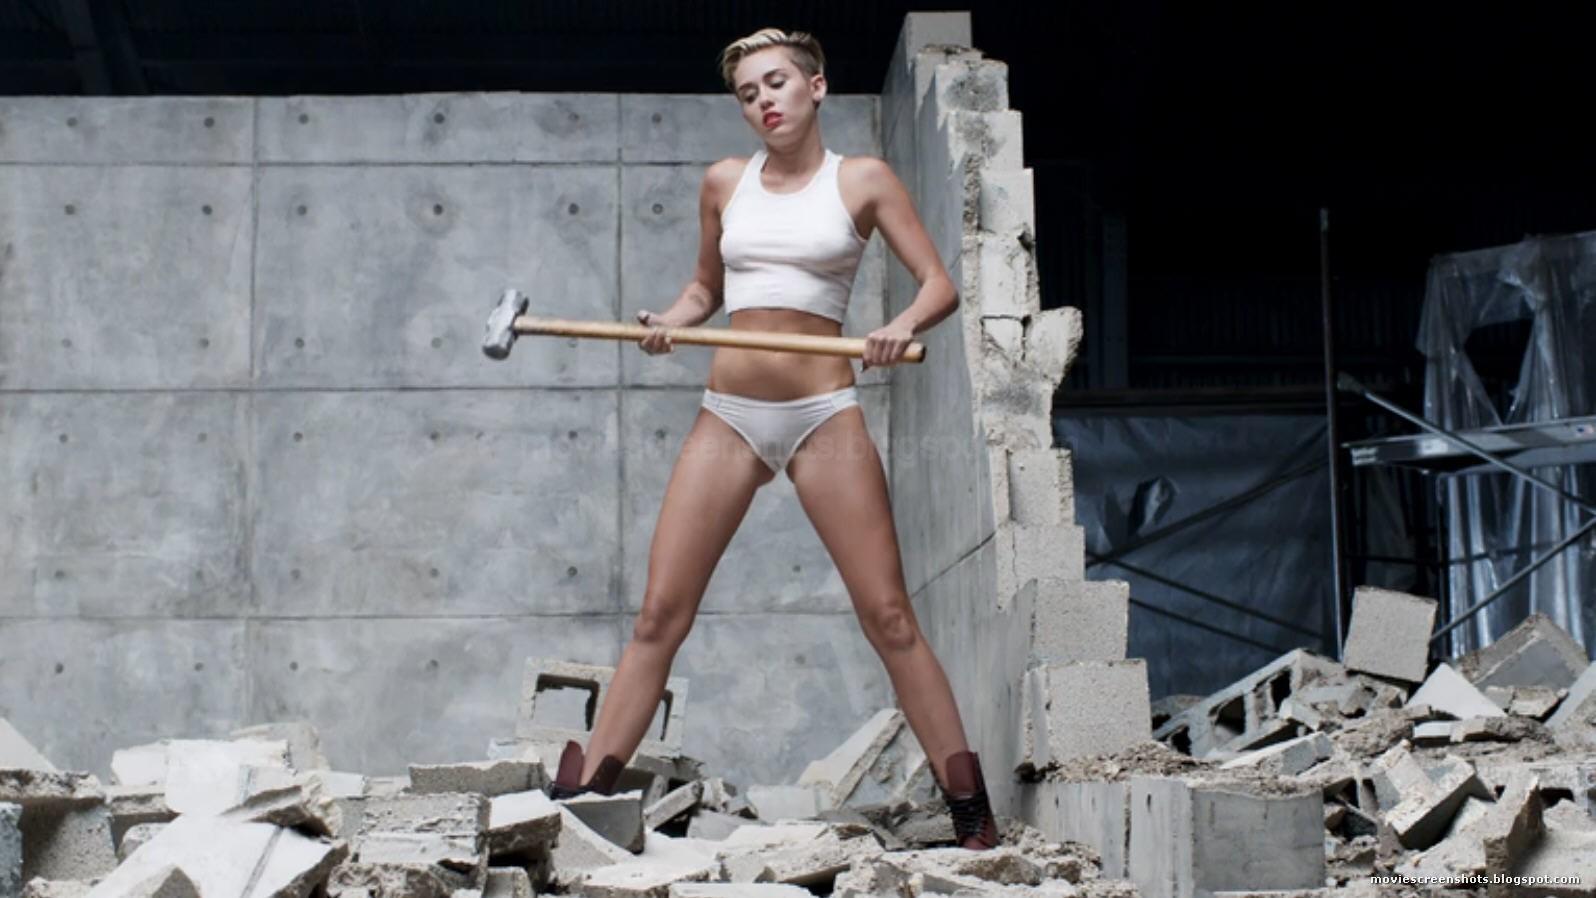 Vagebond's Movie ScreenShots: Miley Cyrus - Wrecking Ball ...